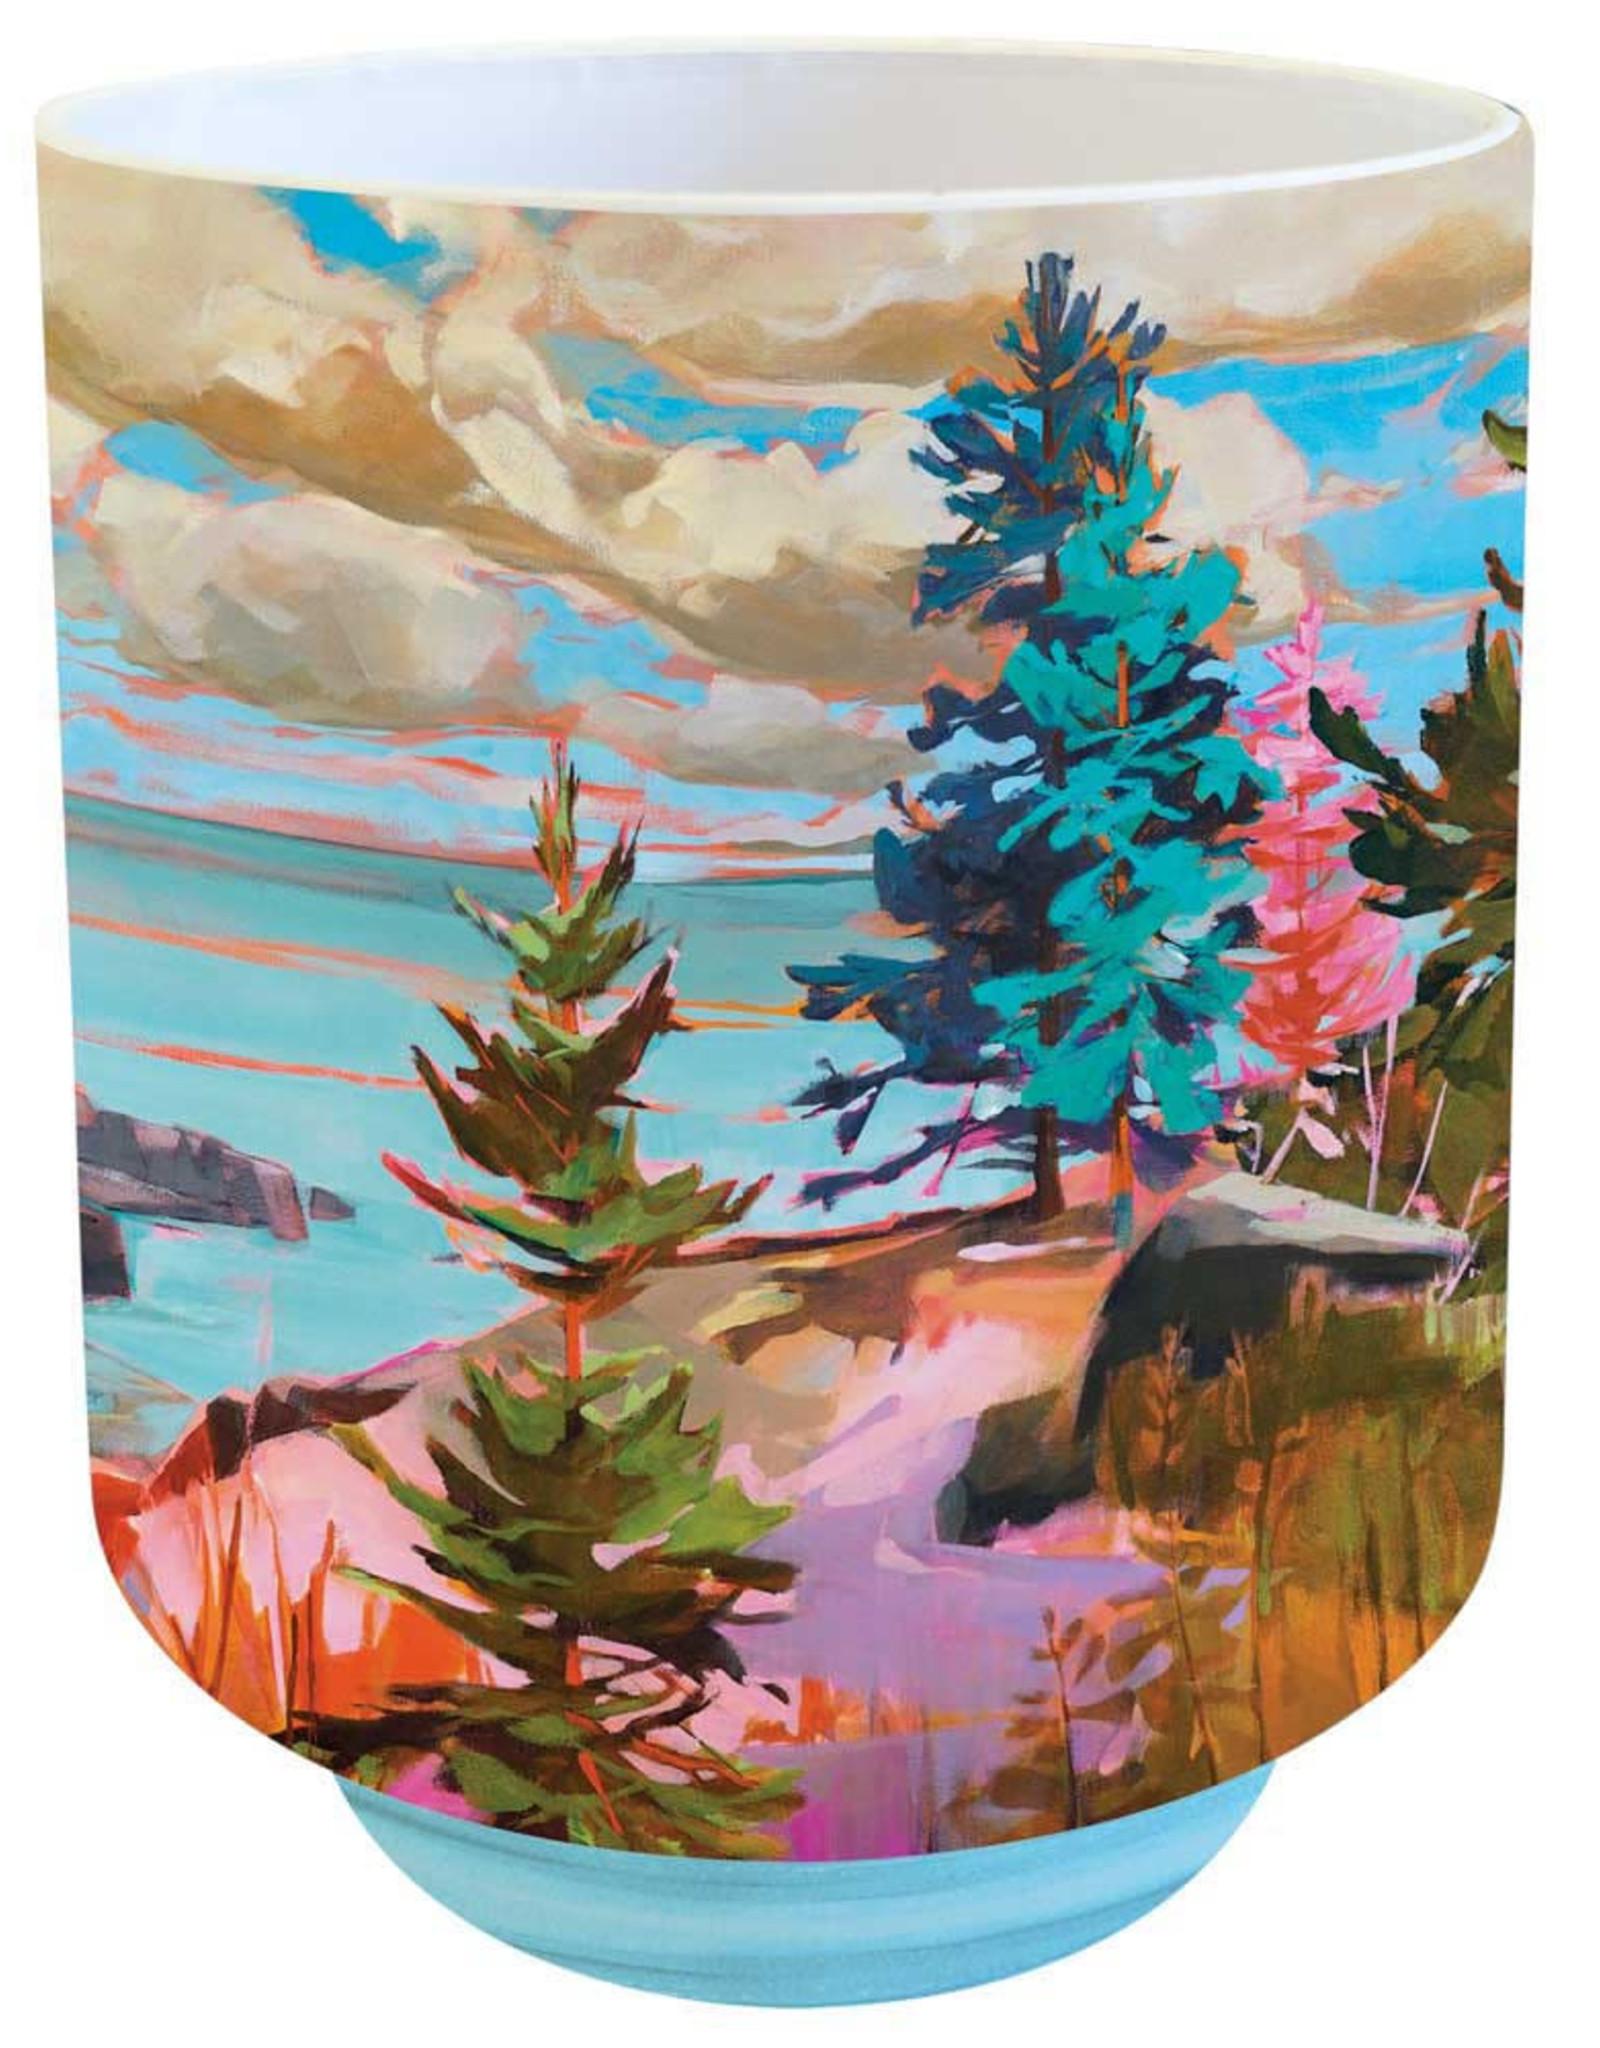 Greenbox Art Next Step Final Vase